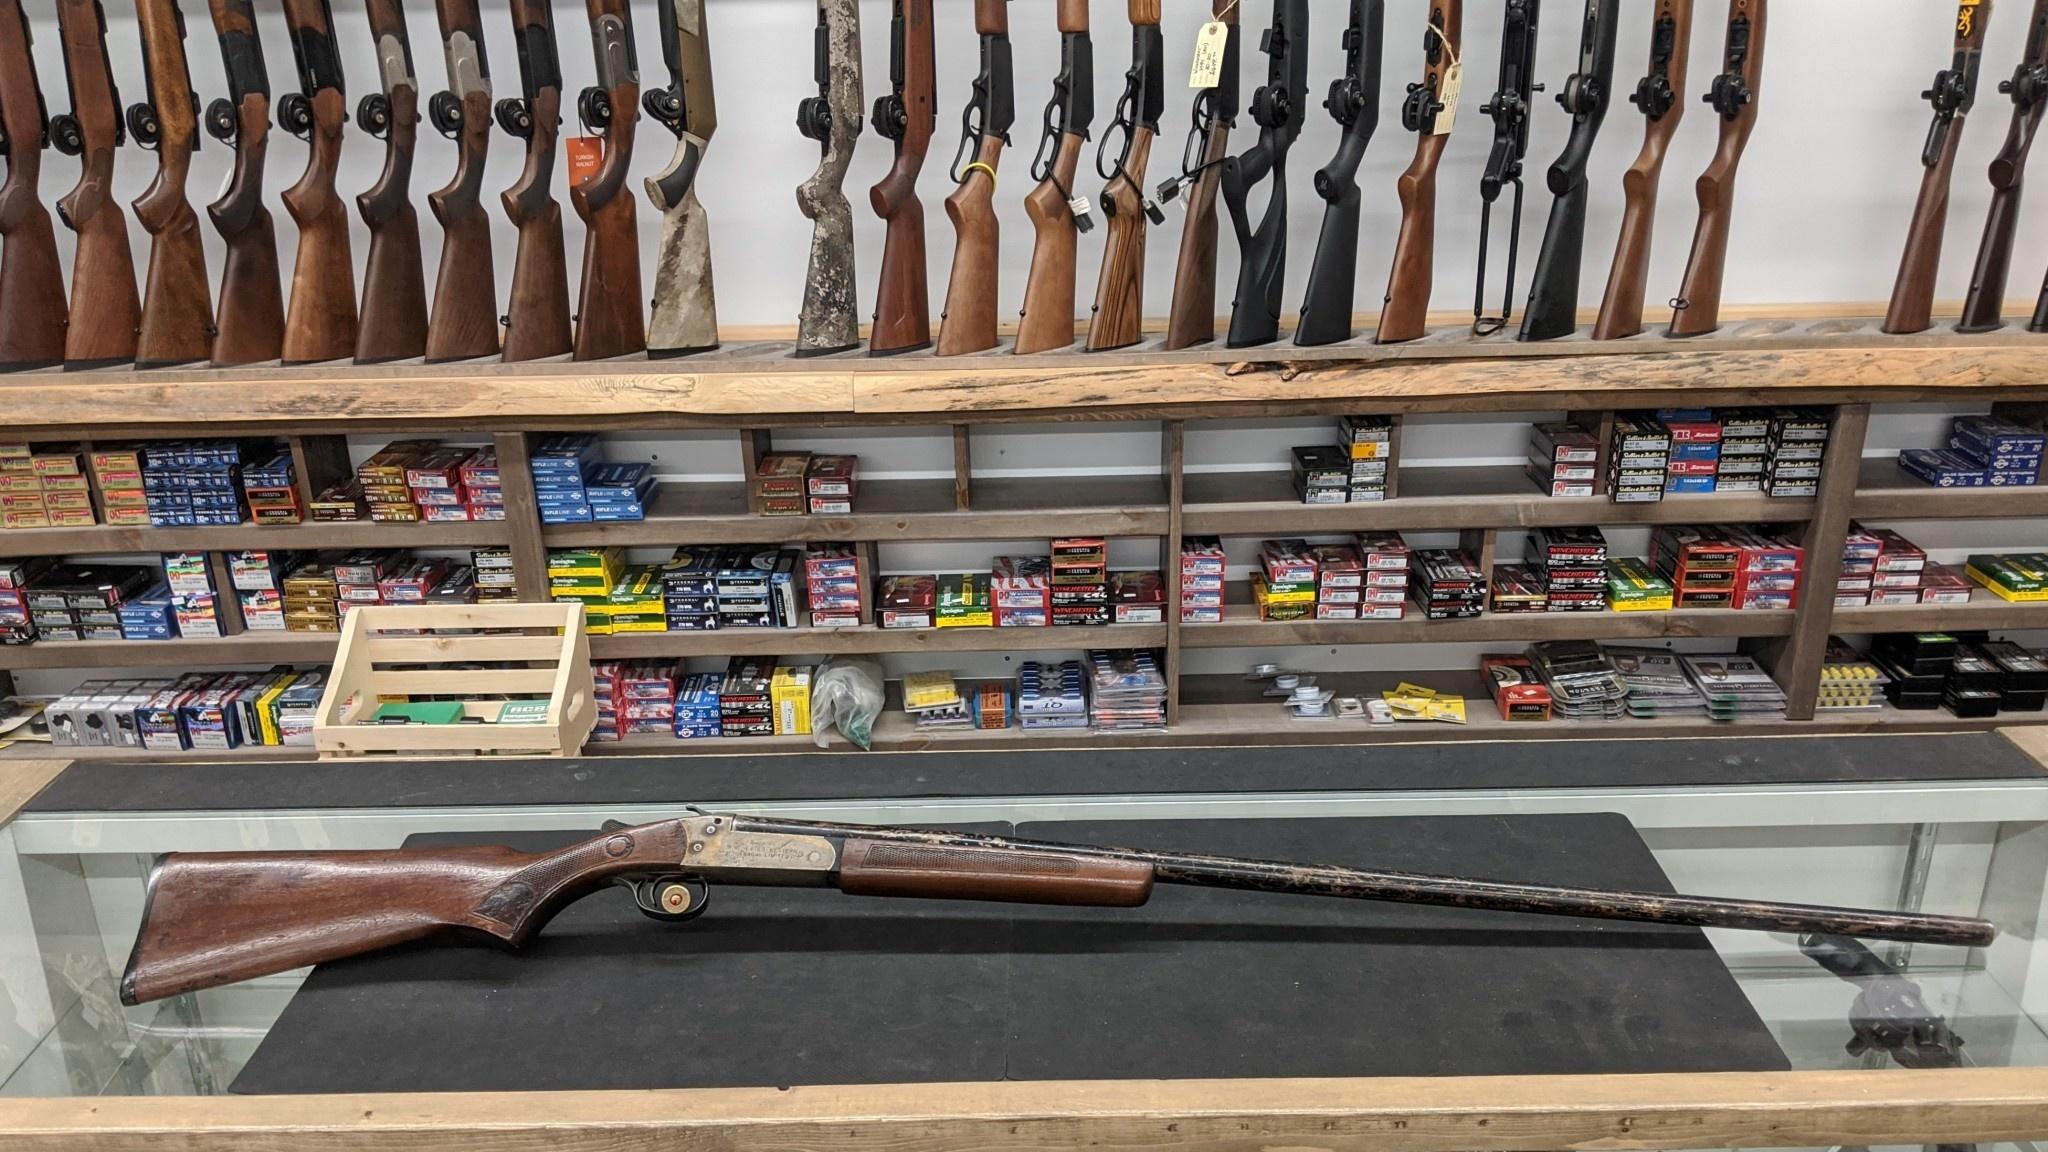 Cooey M840 12 Gauge Shotgun